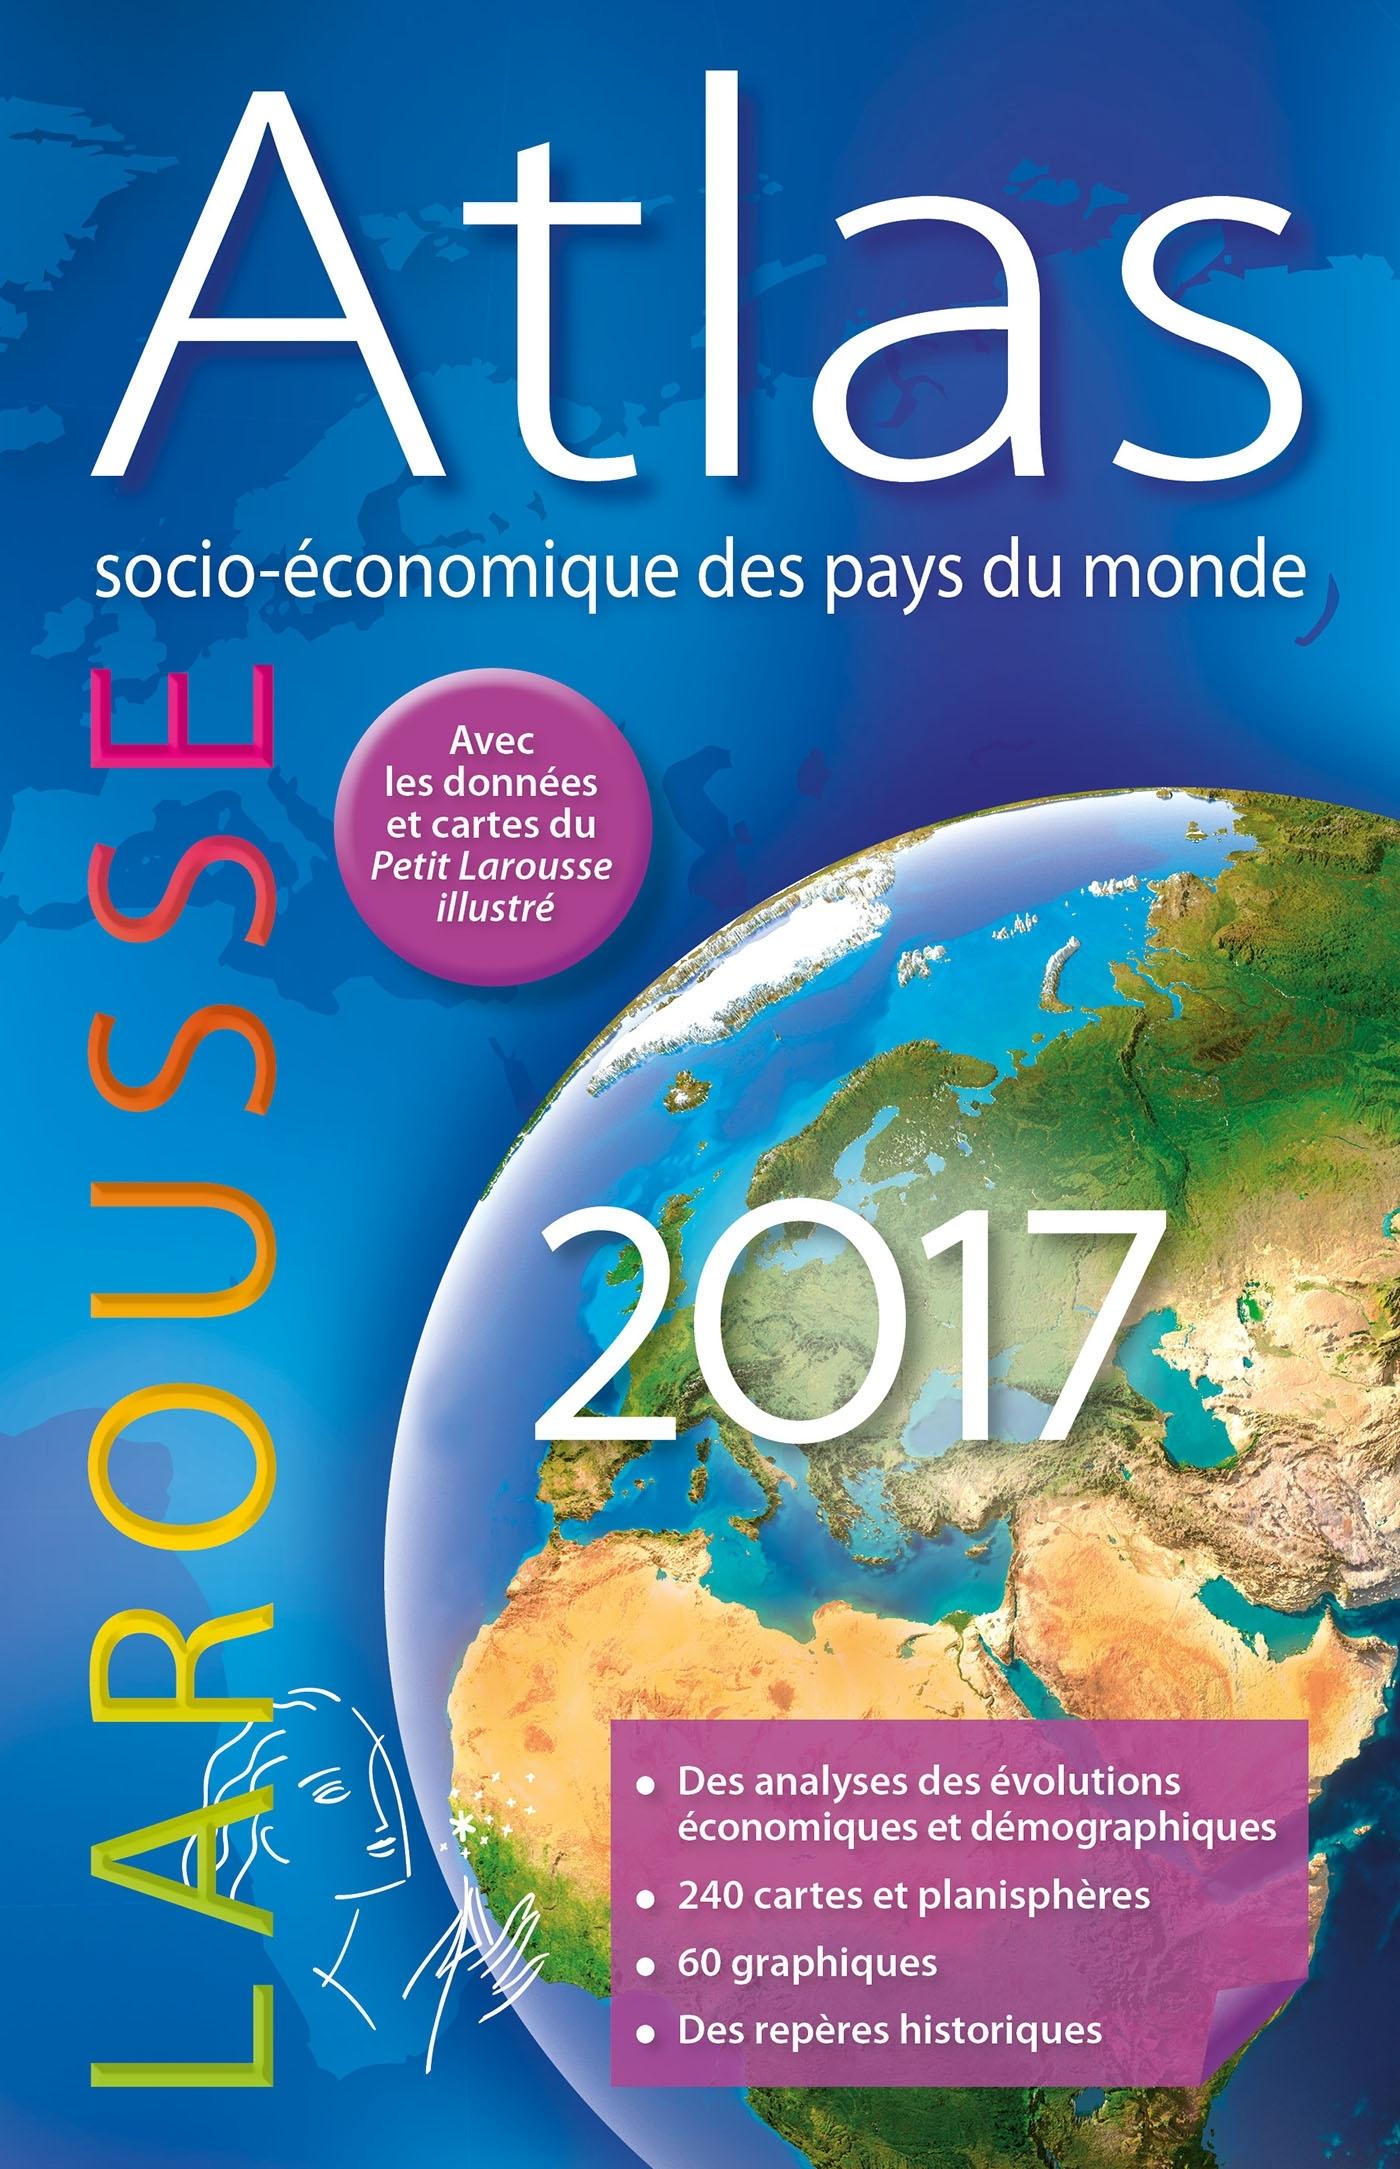 ATLAS SOCIO-ECONOMIQUE DES PAYS DU MONDE 2017